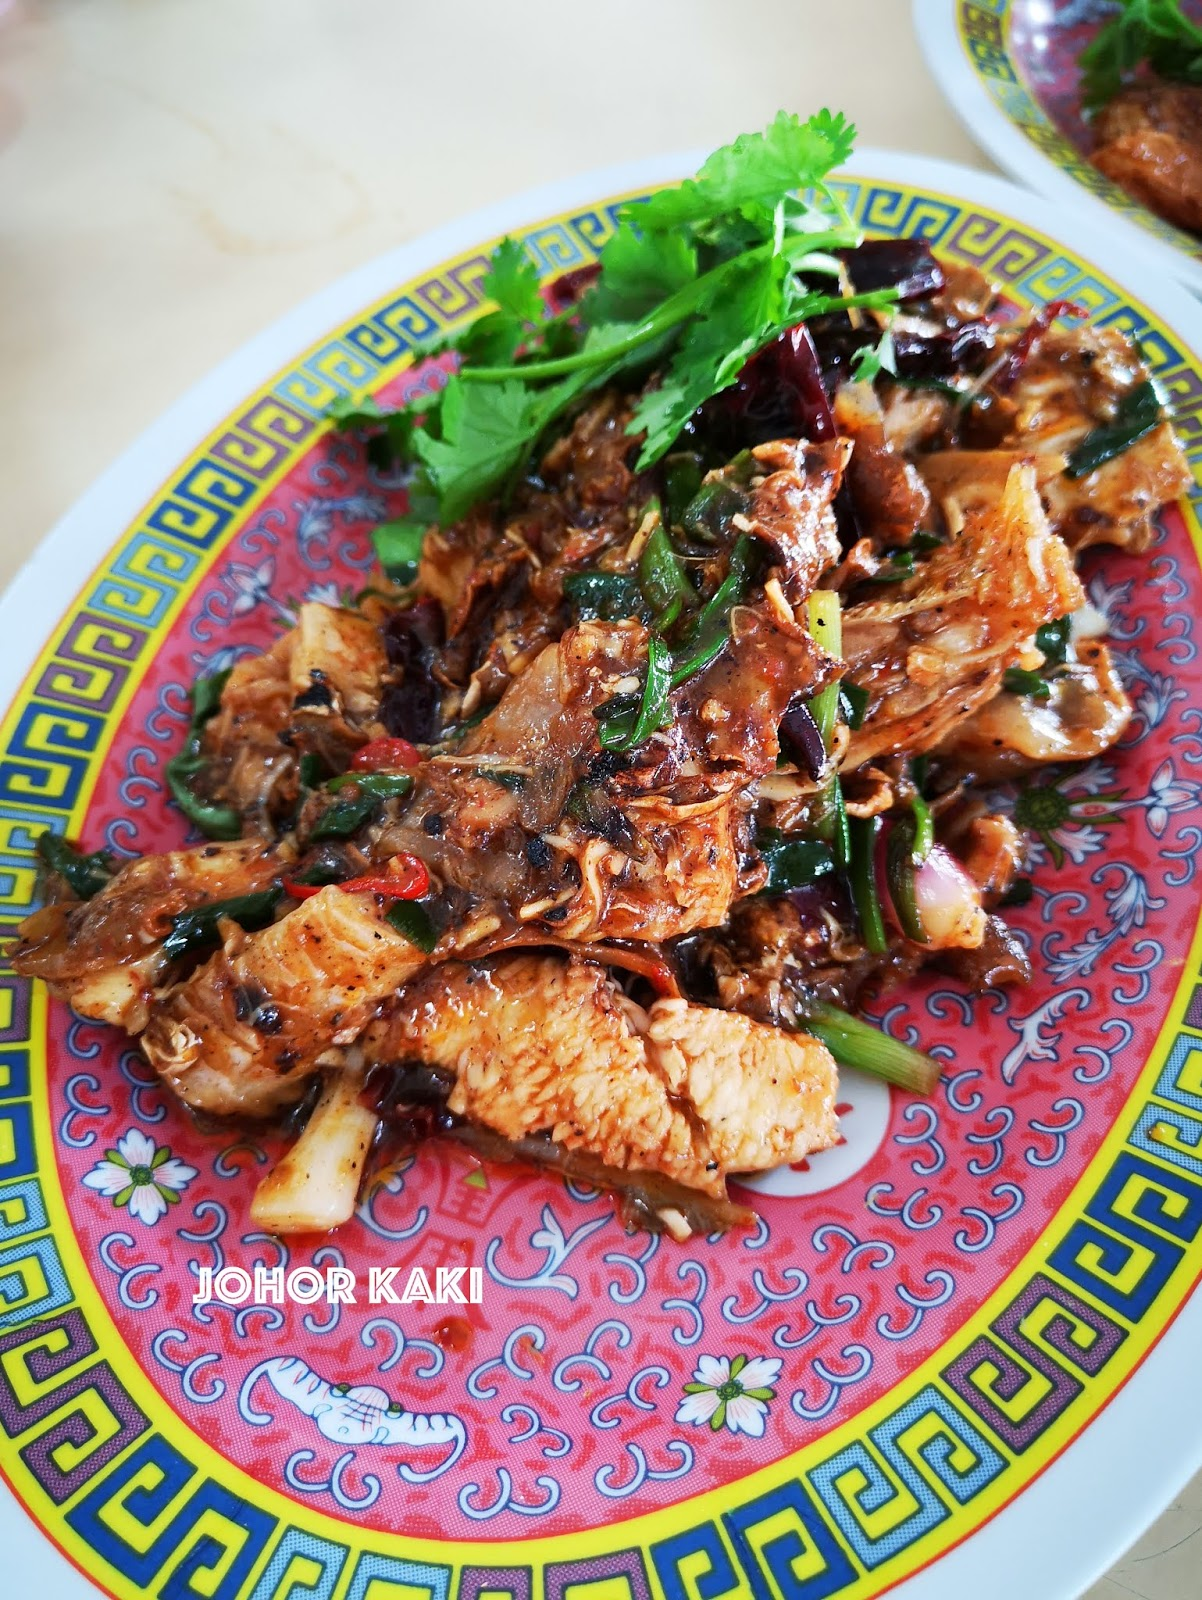 Restoran Cm ɘ¿æ˜Ž In Taman Pelangi Johor Bahru Johor Kaki Travels For Food